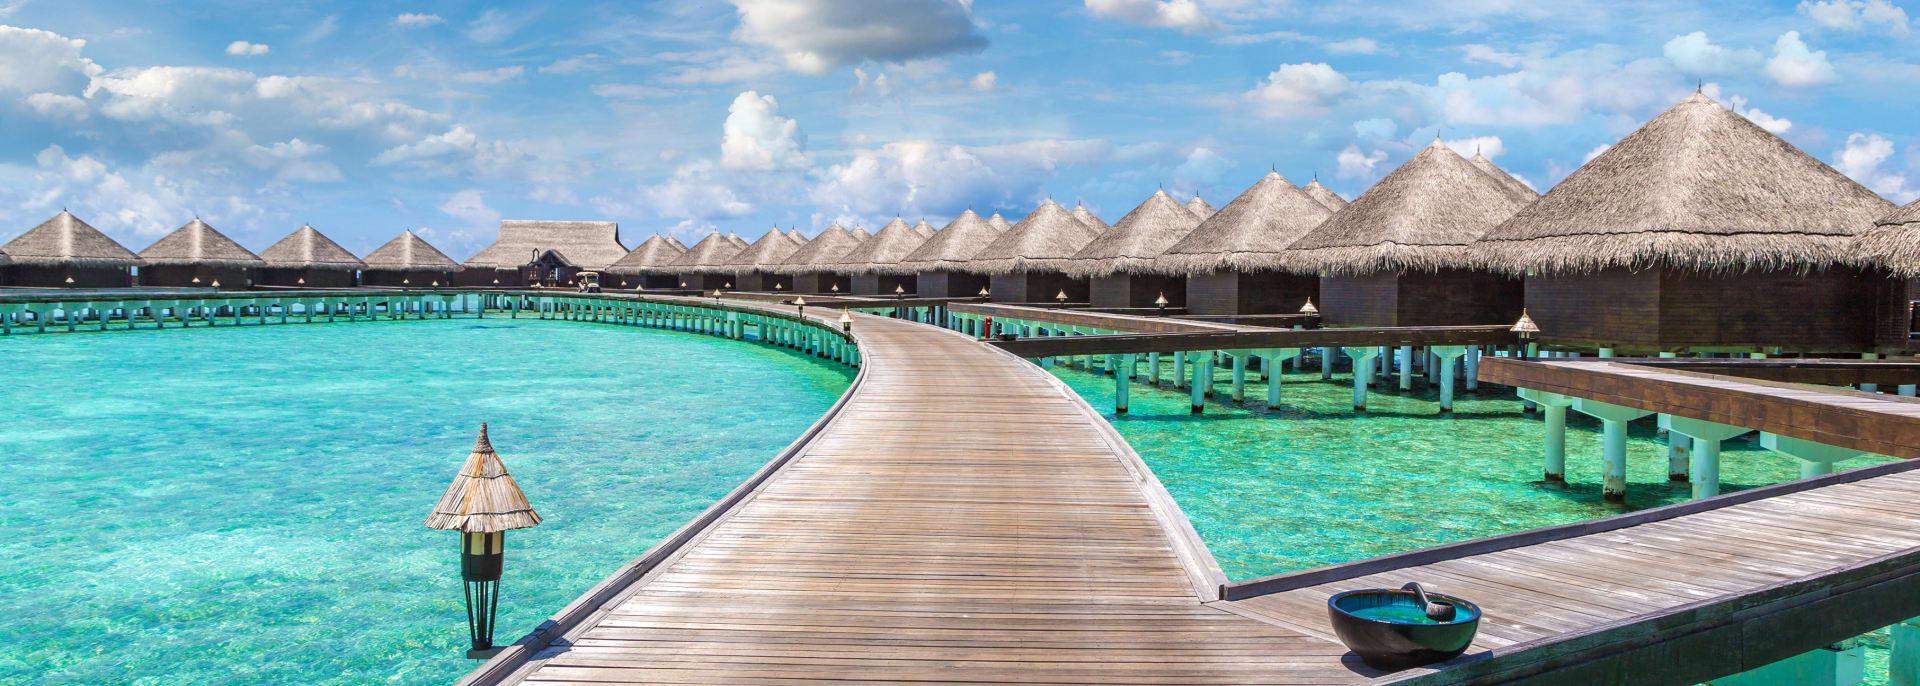 Atolle Süd Nilandhe, Malediven